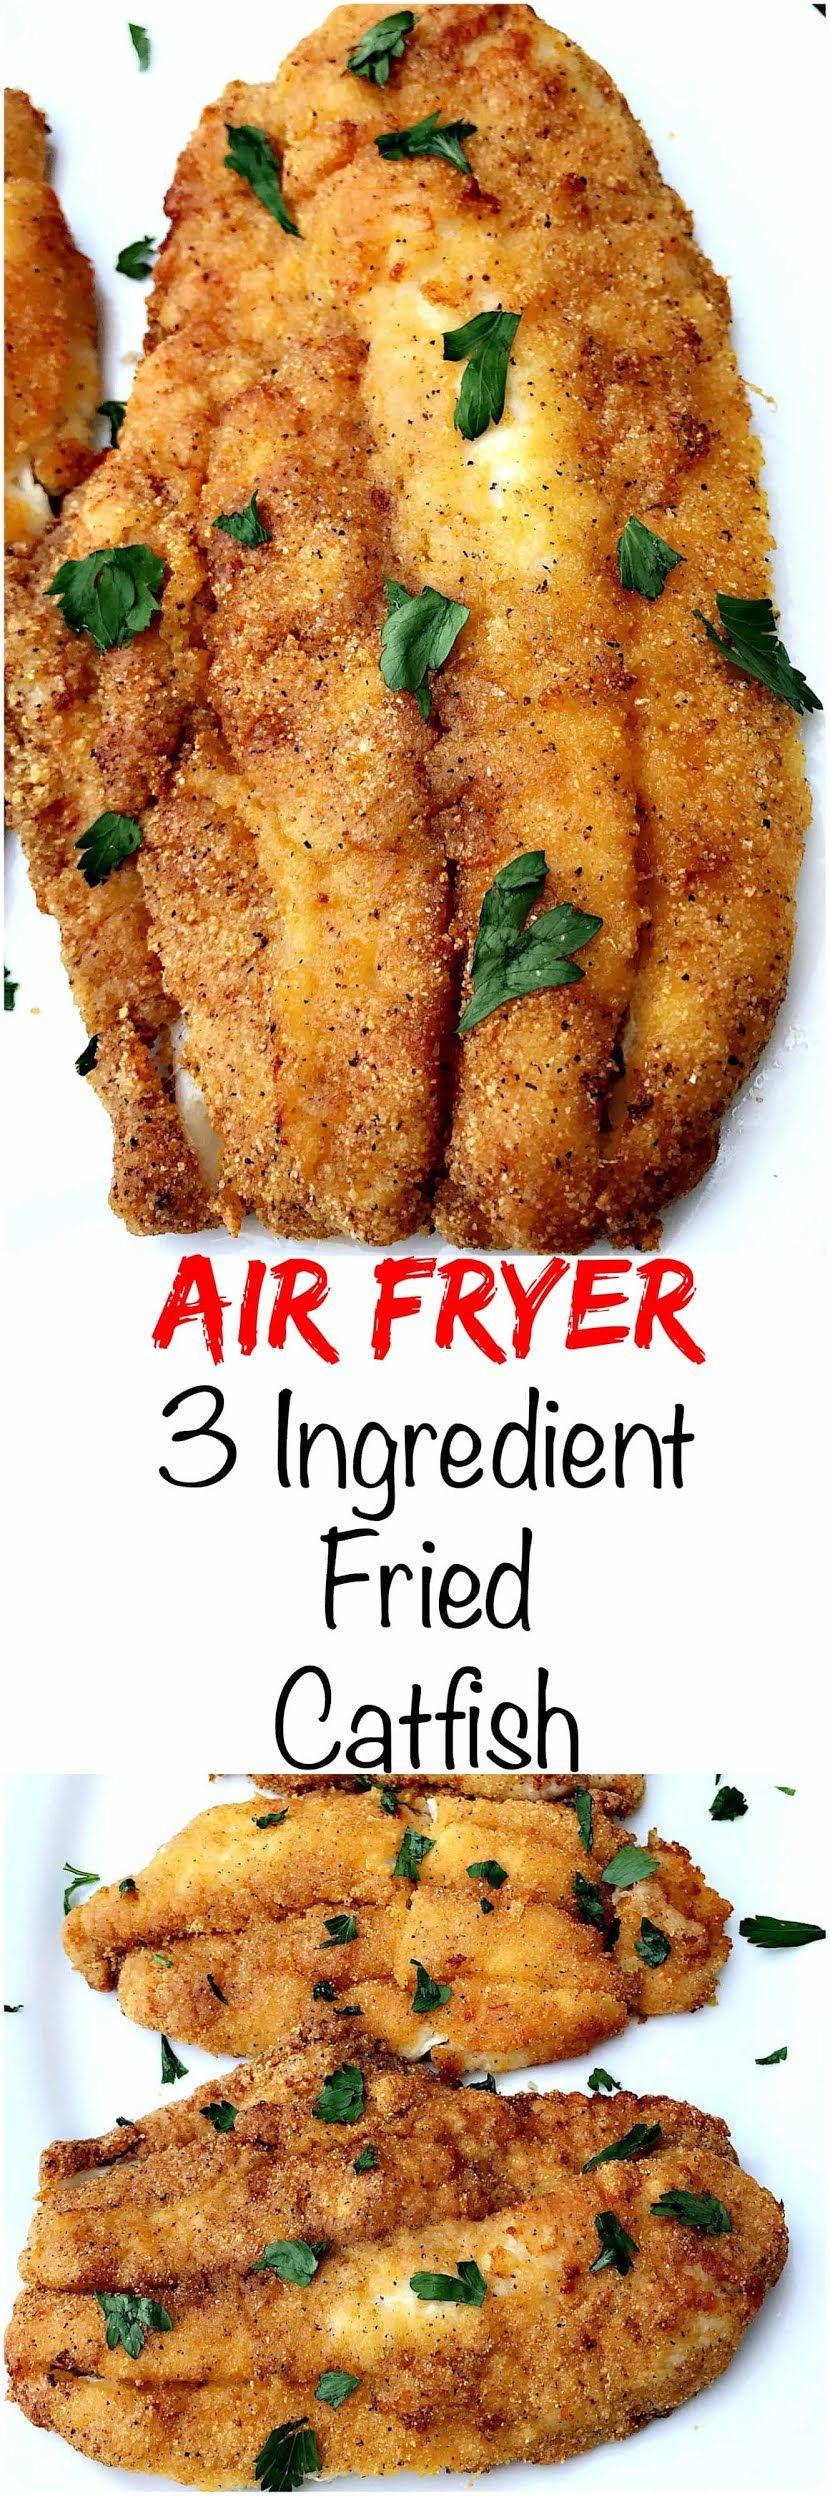 air fryer 3 ingredient fried catfish Air fryer recipes